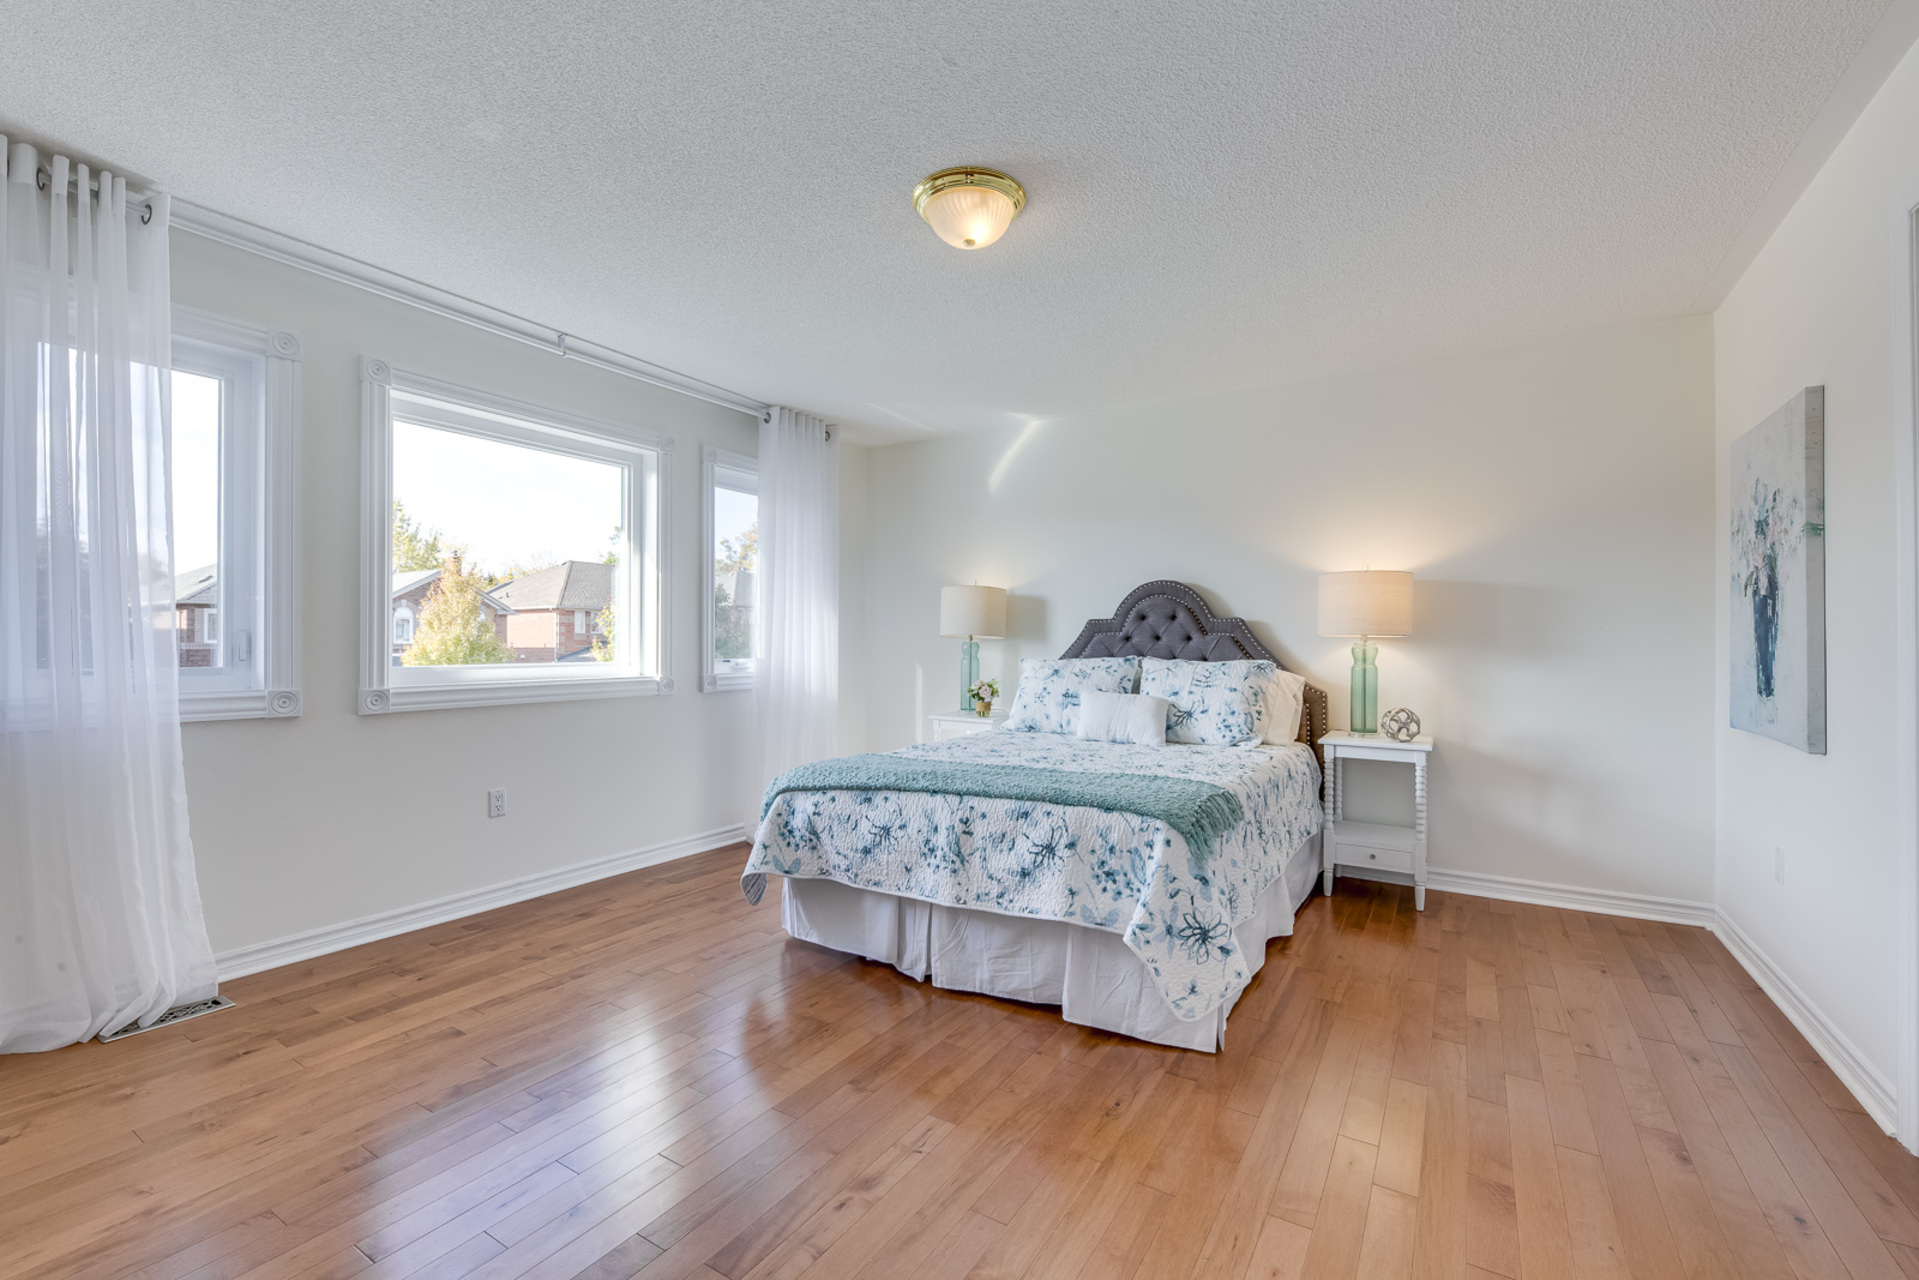 2nd Bedroom - 1806 Glenvista Dr, Oakville - Elite3 & Team at 1806 Glenvista Drive, Iroquois Ridge North, Oakville